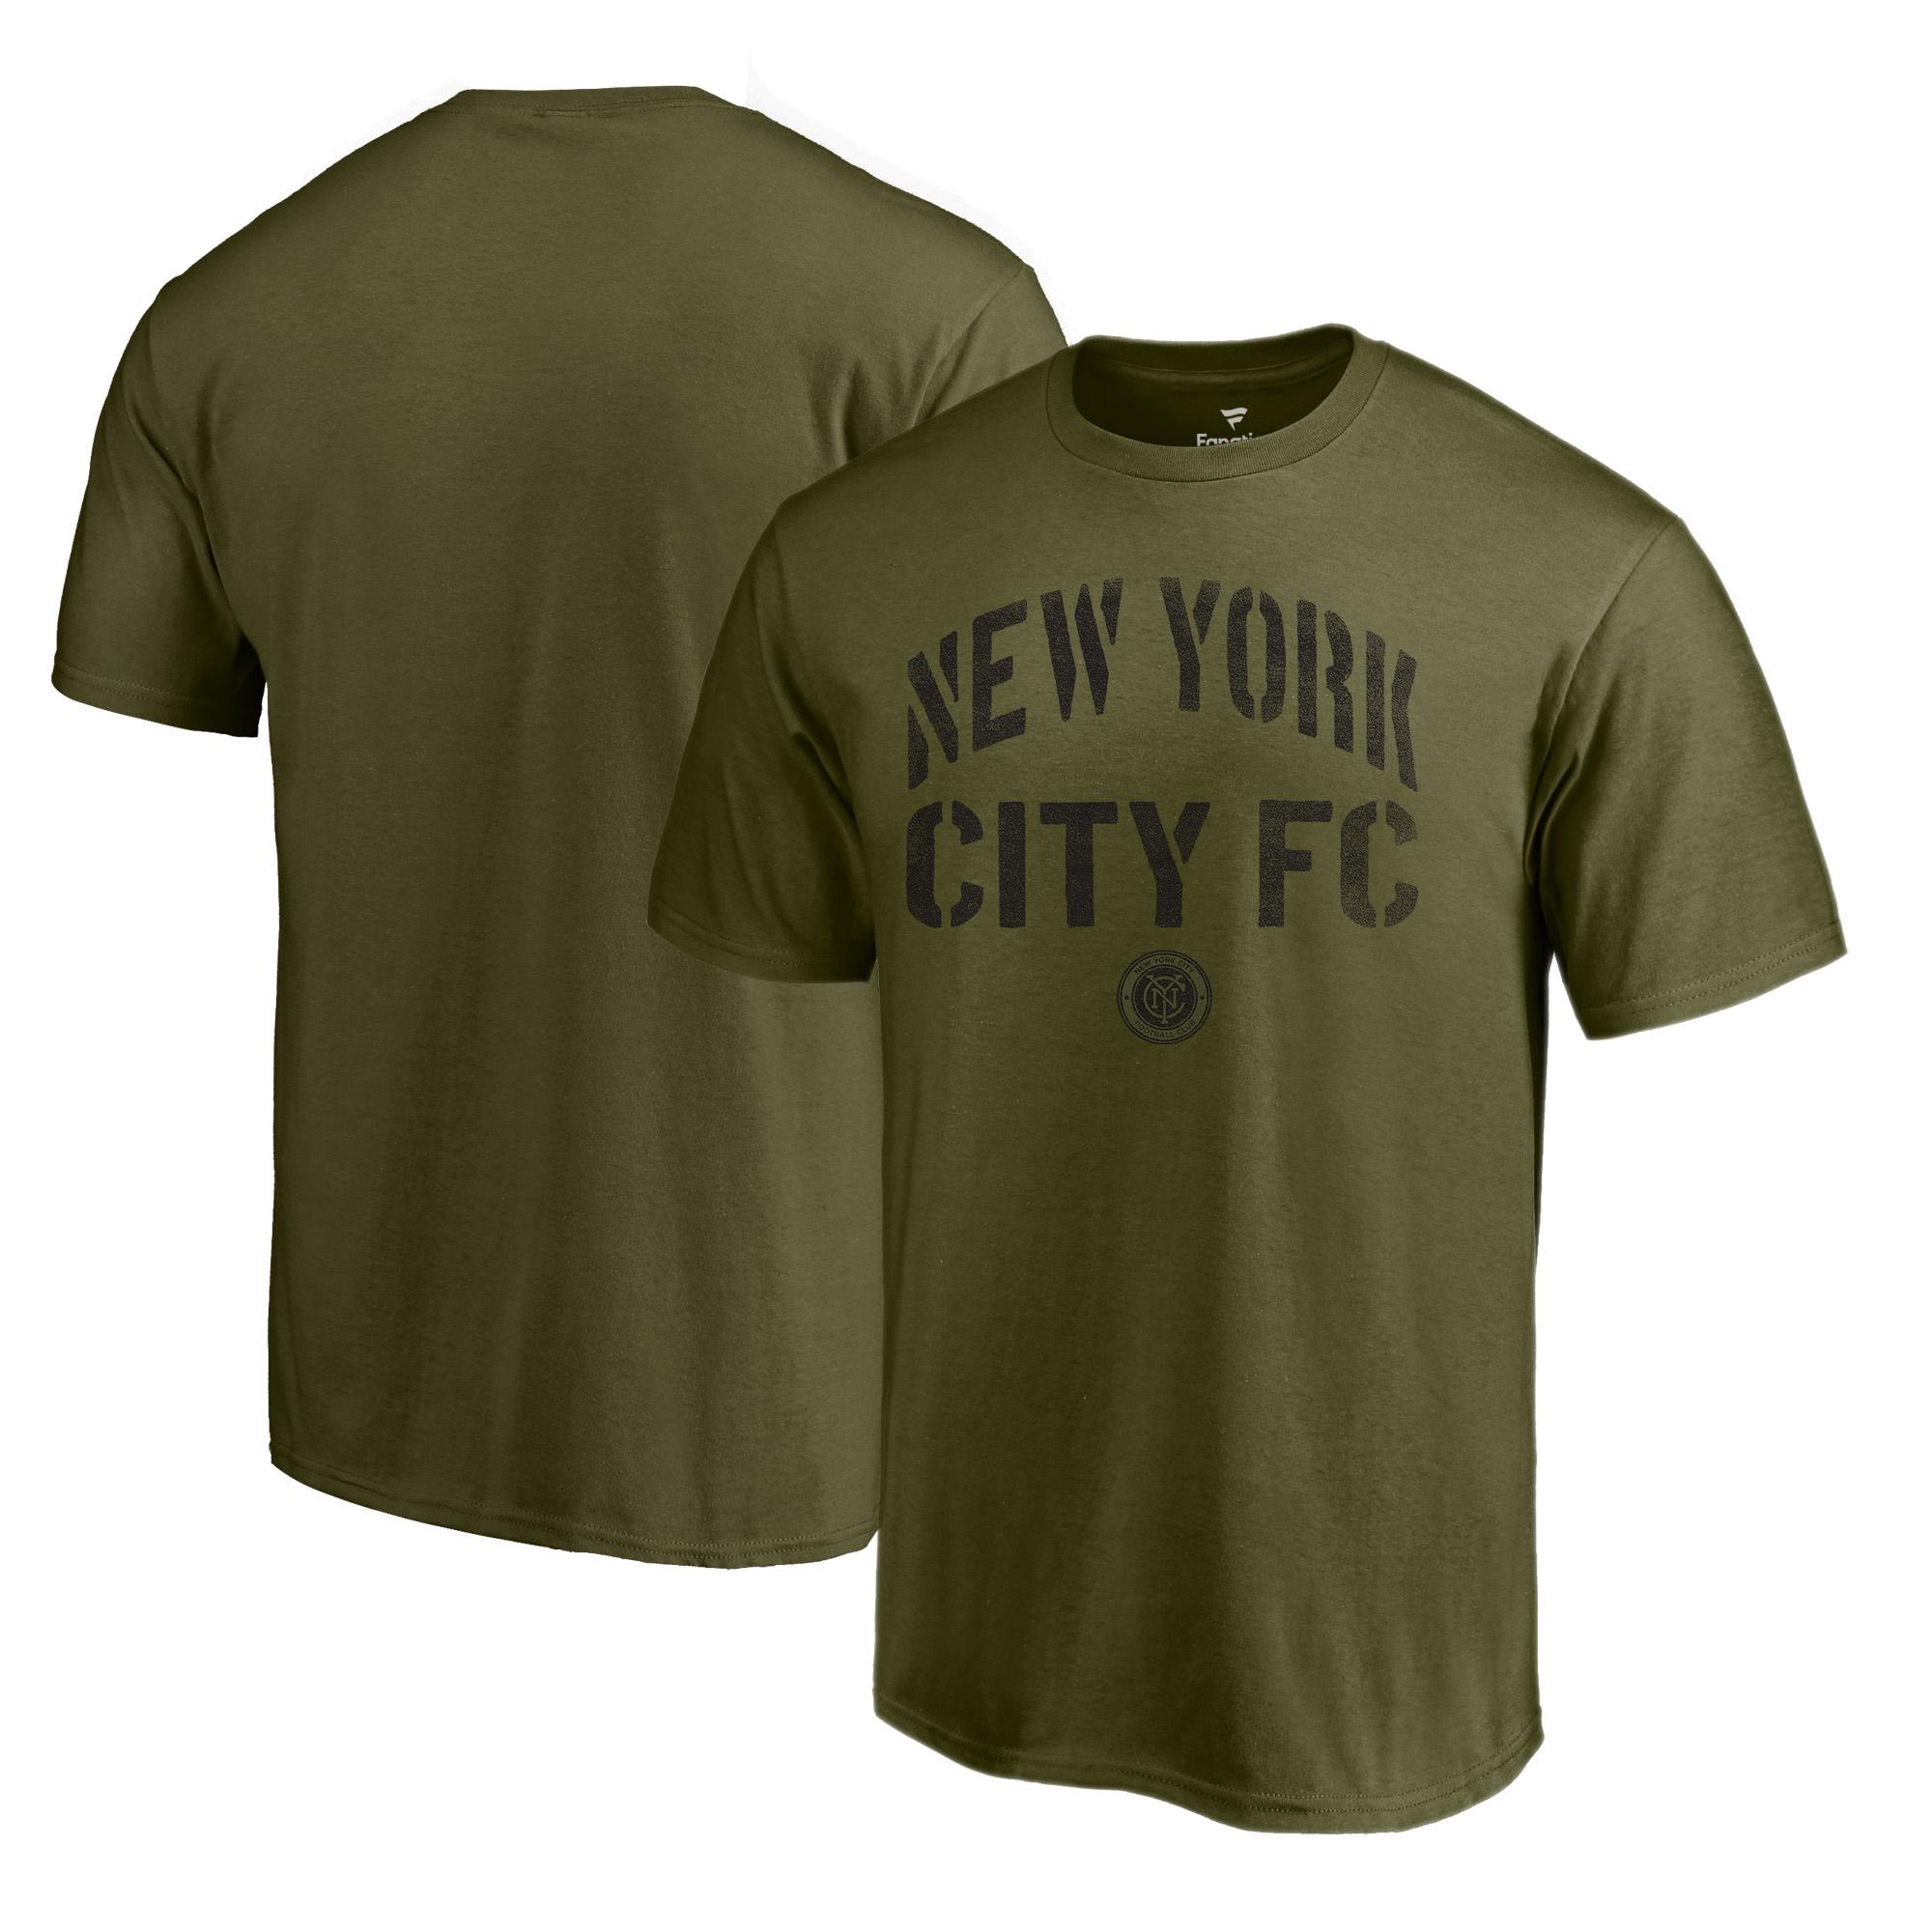 New York City FC Fanatics Branded Camo Collection Jungle T-Shirt - Green